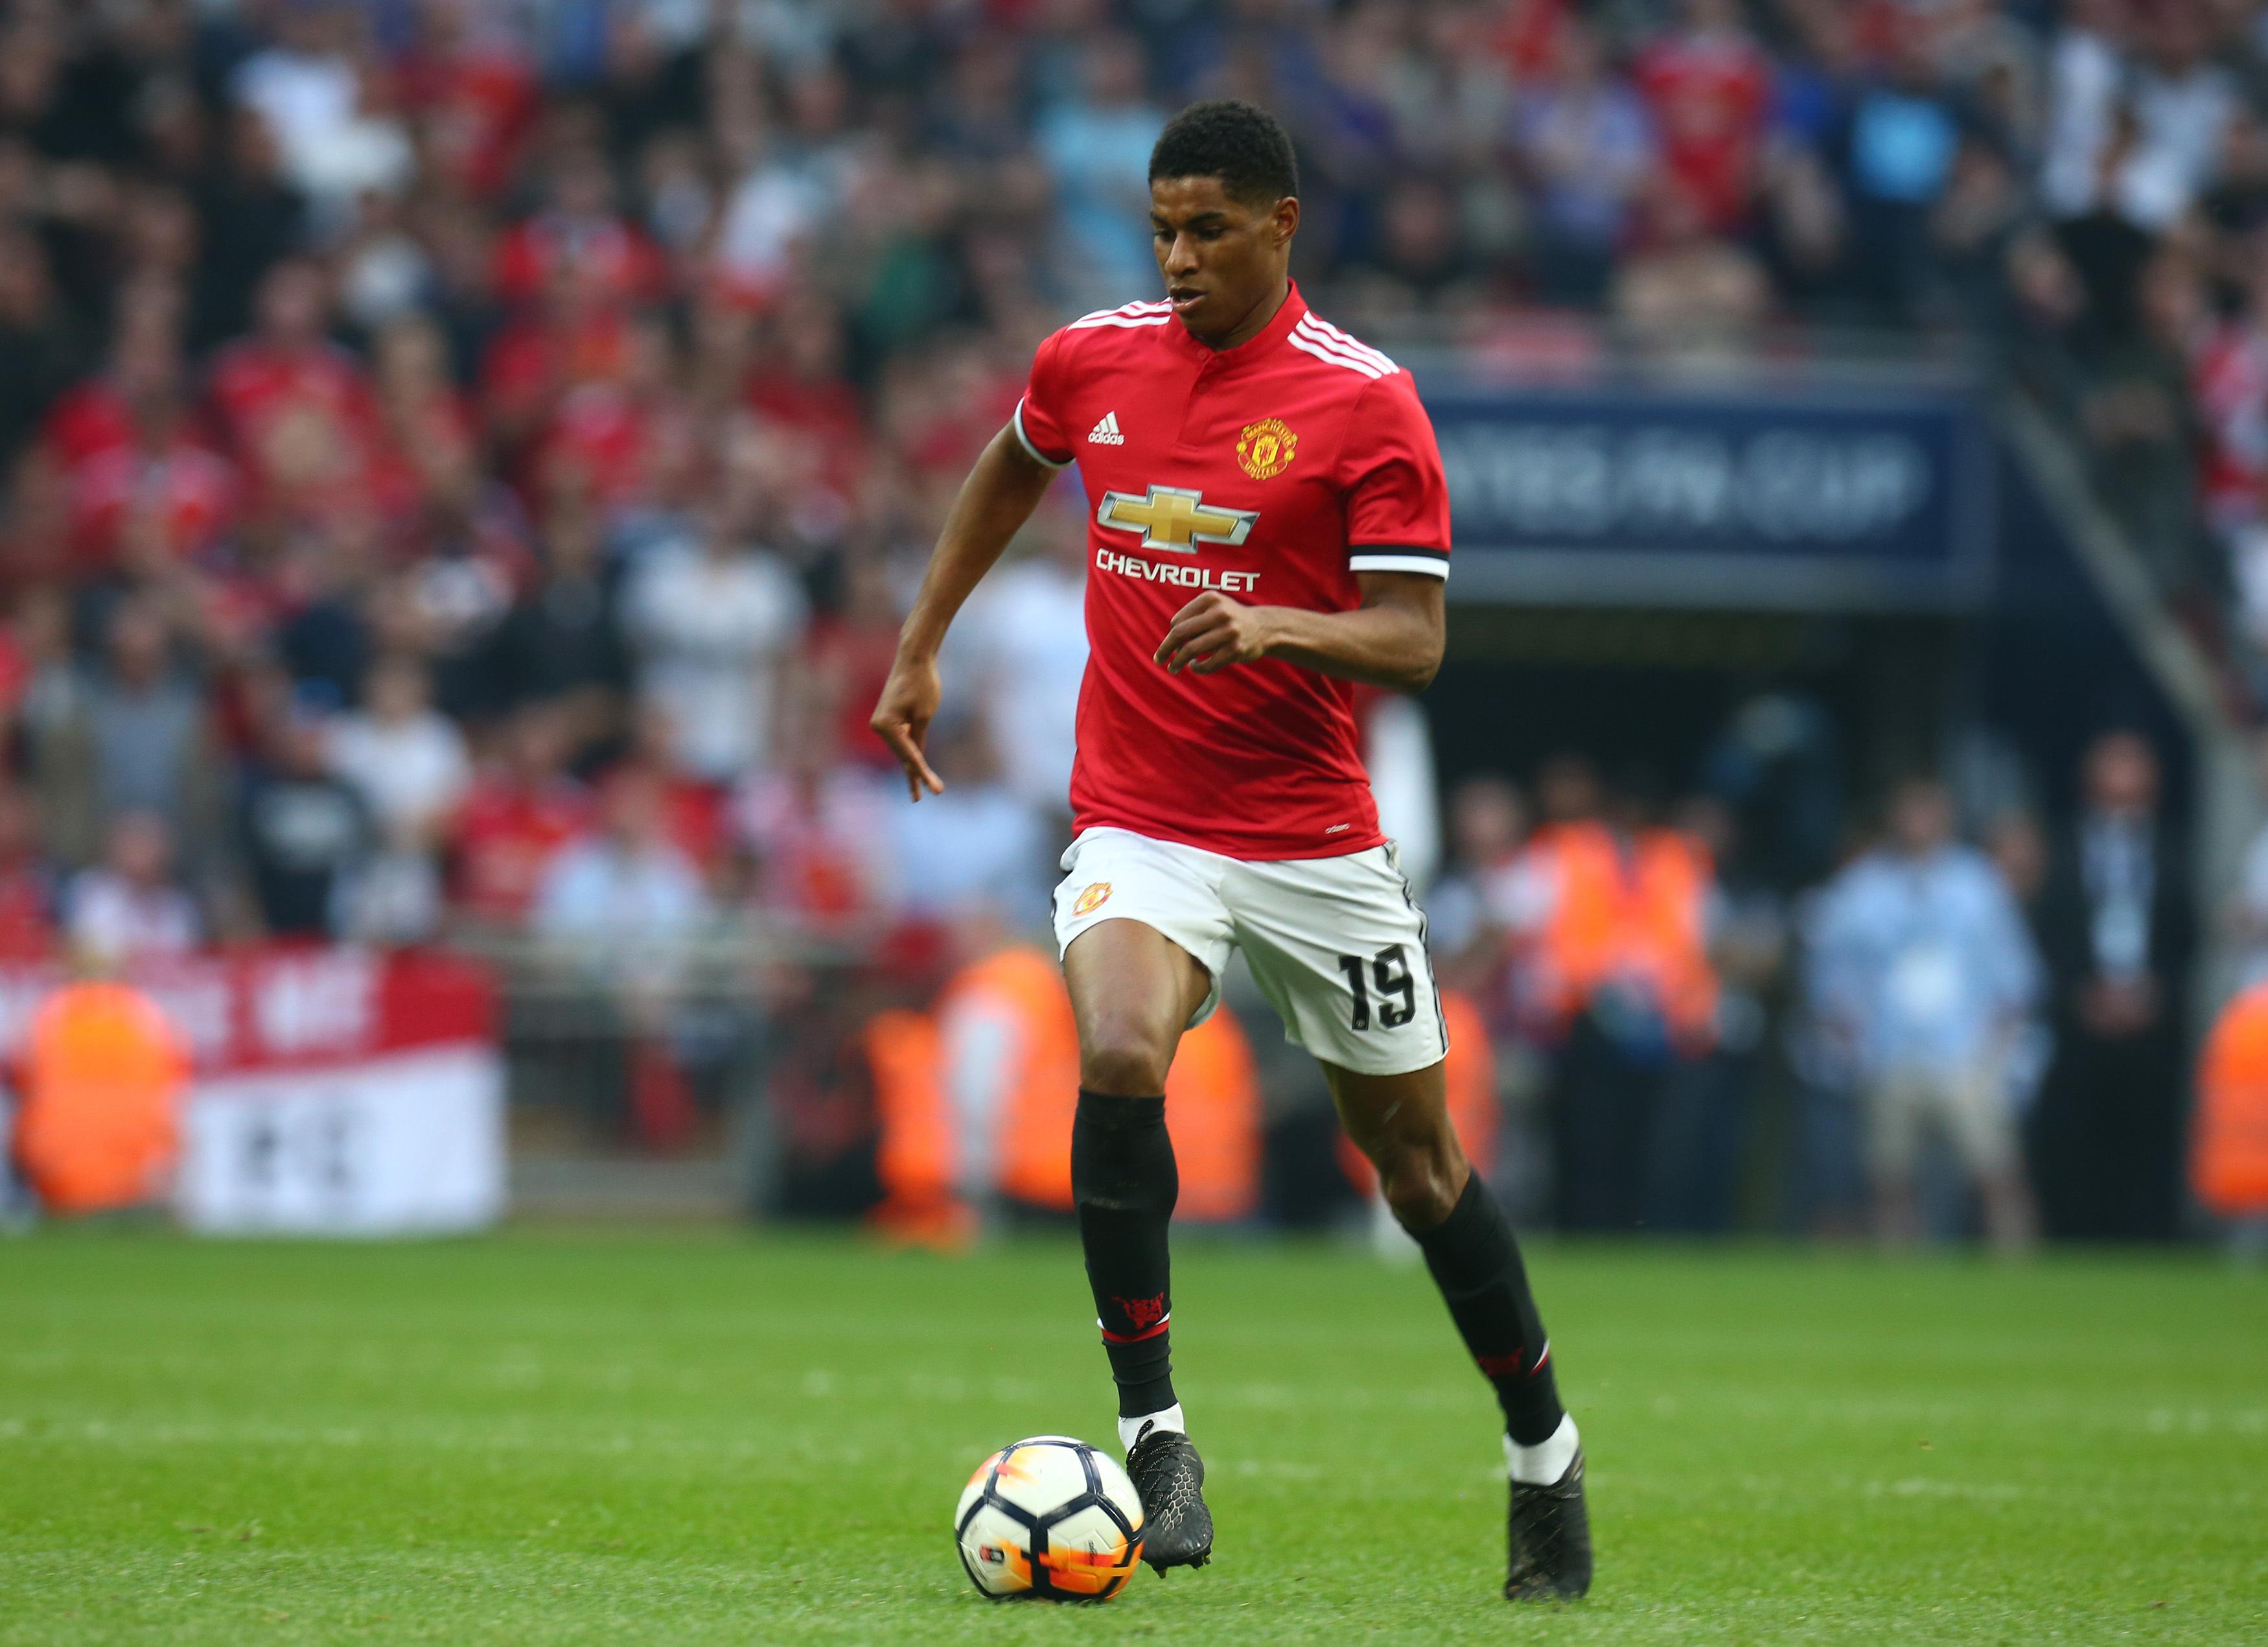 Meninggalkan Manchester United